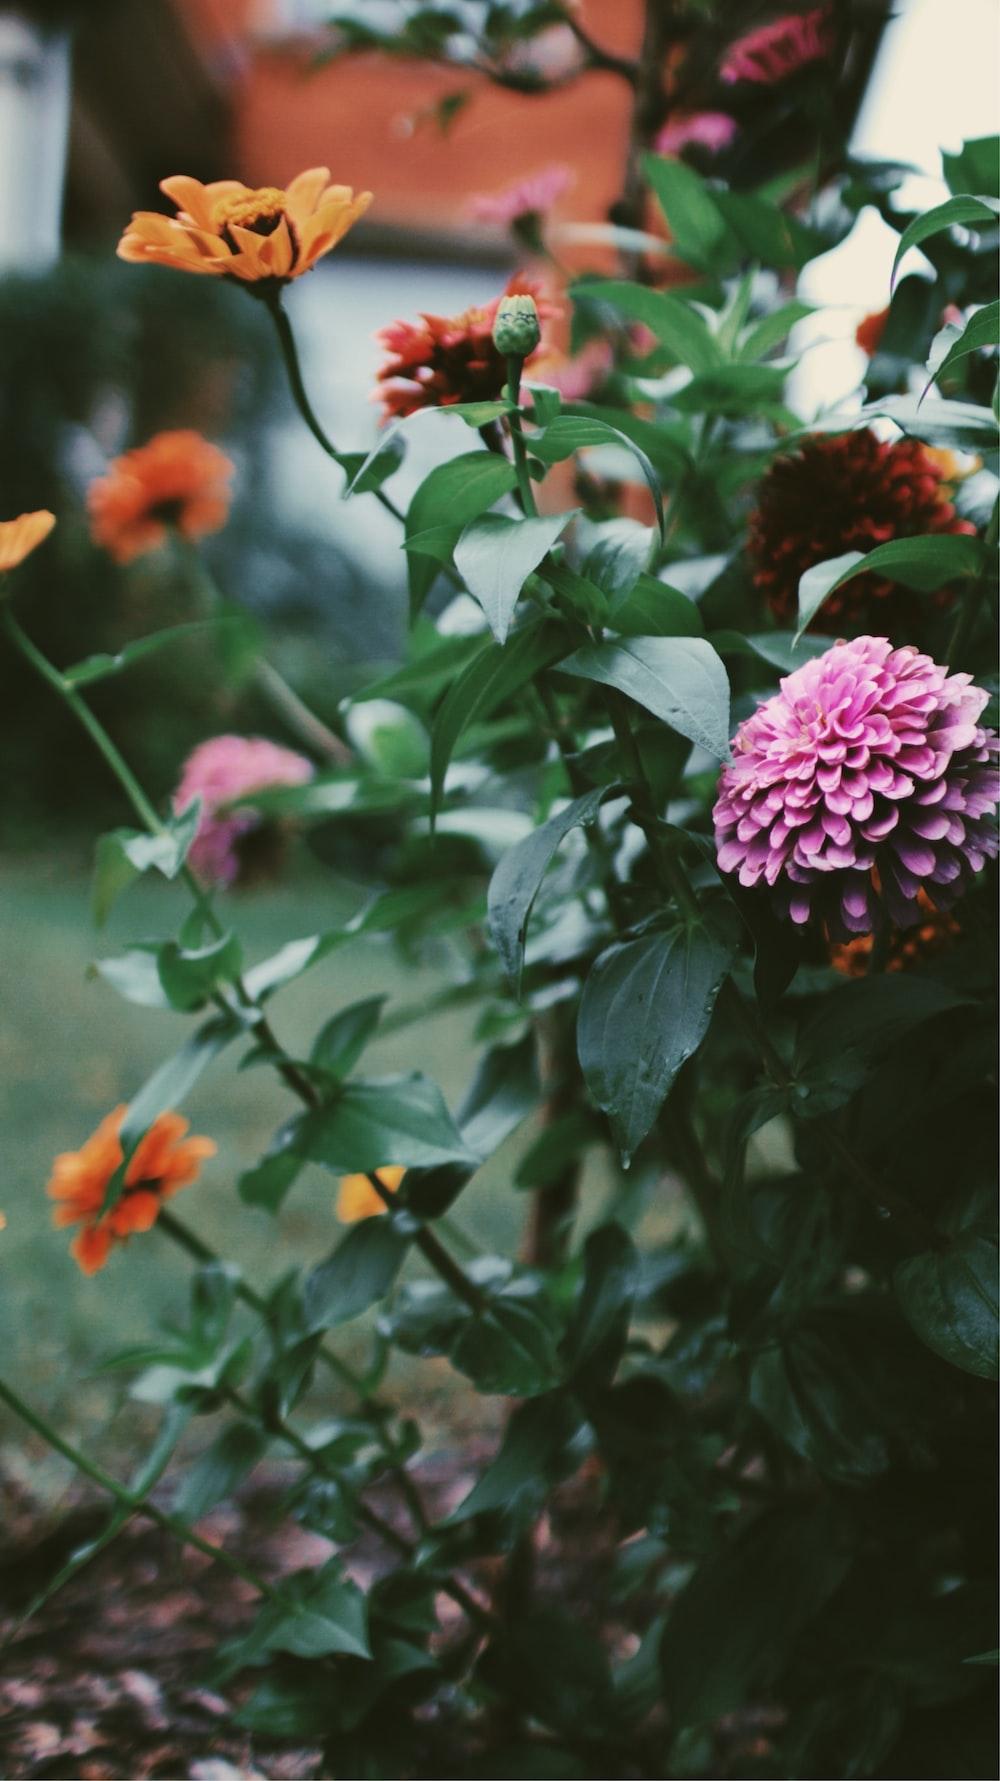 selective focus of pink flower near orange flowers